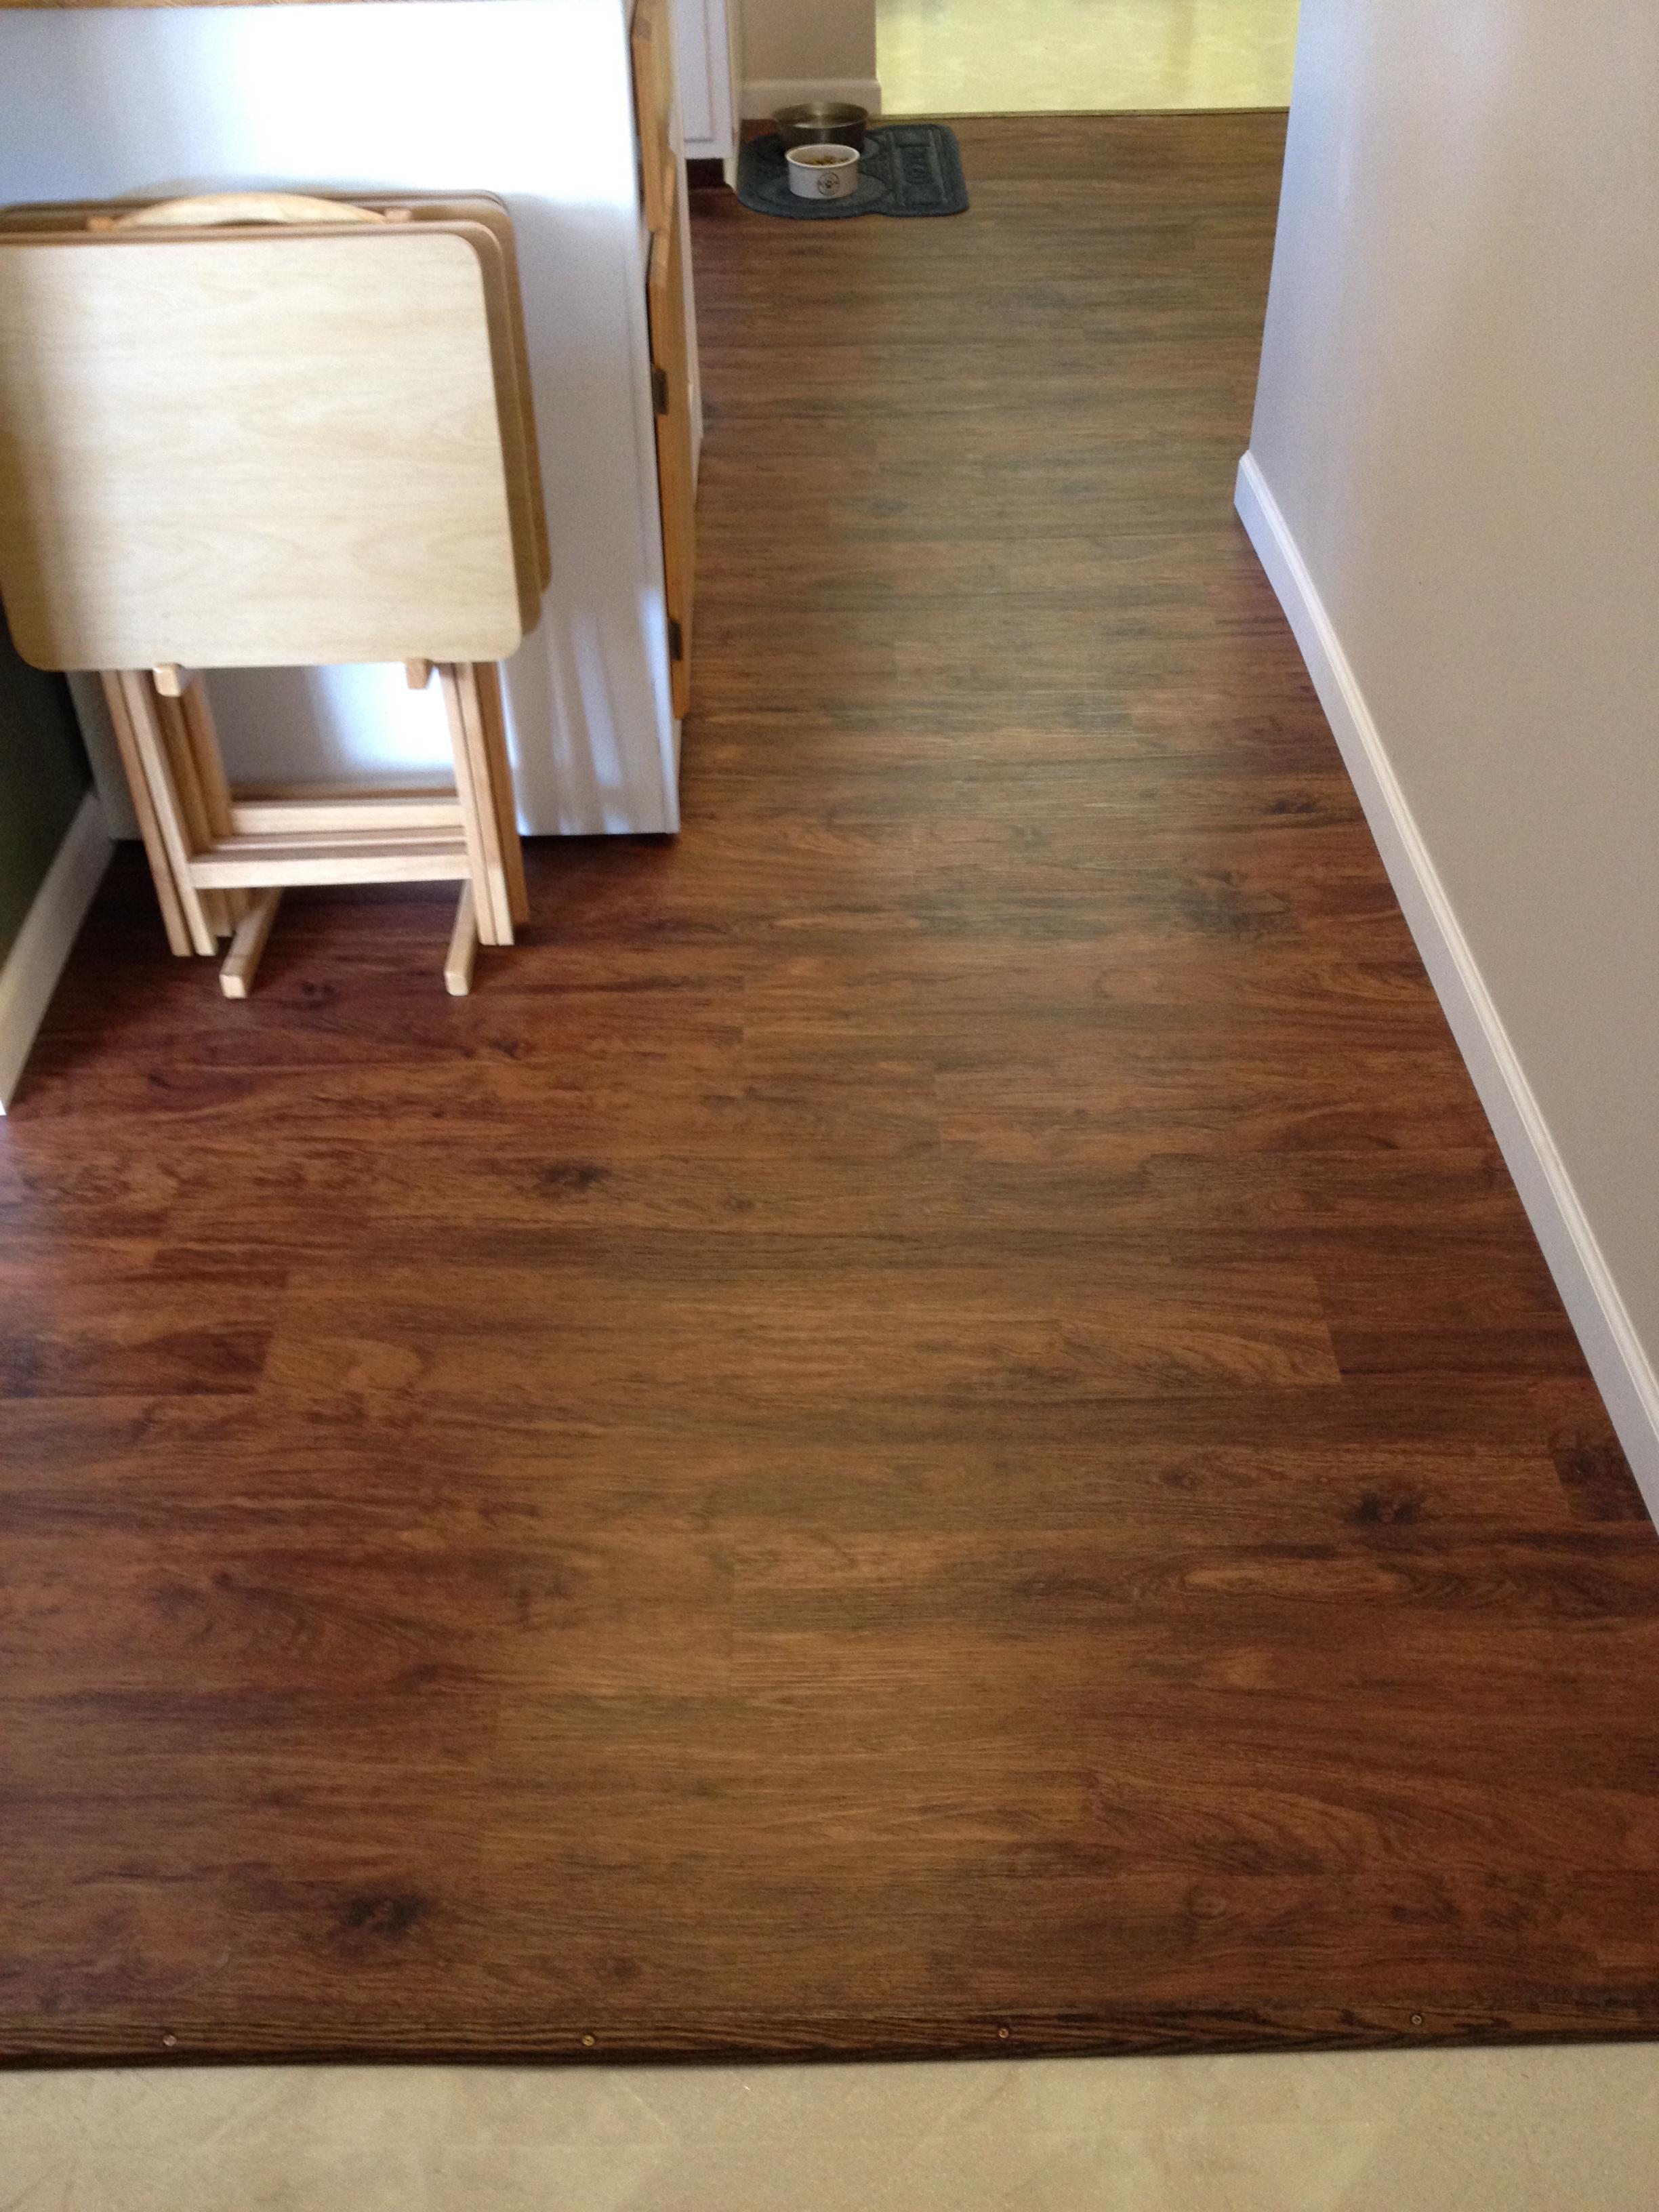 Adura Vinyl Tile Vinyl Flooring Adura Tile 50 IN Plank